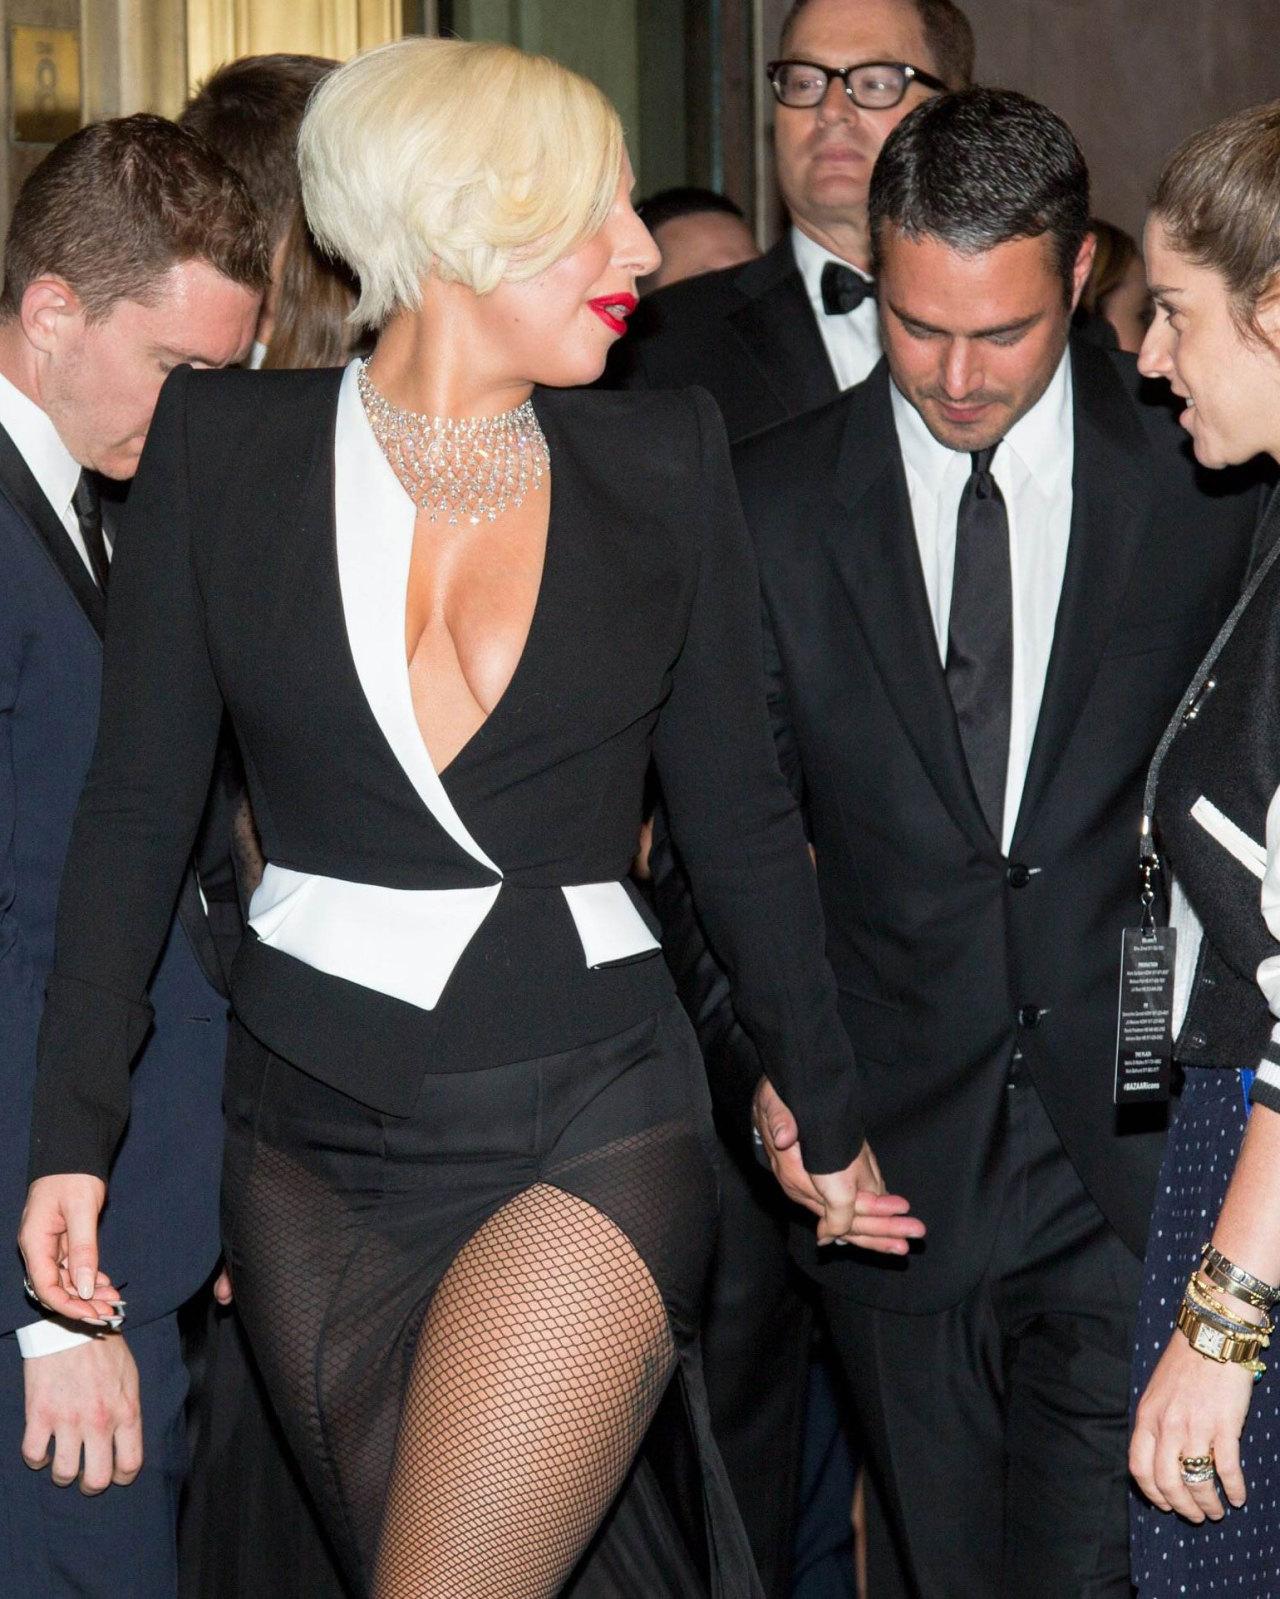 Lady Gaga and Taylor Kinney. - Page 3 Tumblr_nbhl1tOYMQ1rz7rr7o3_1280